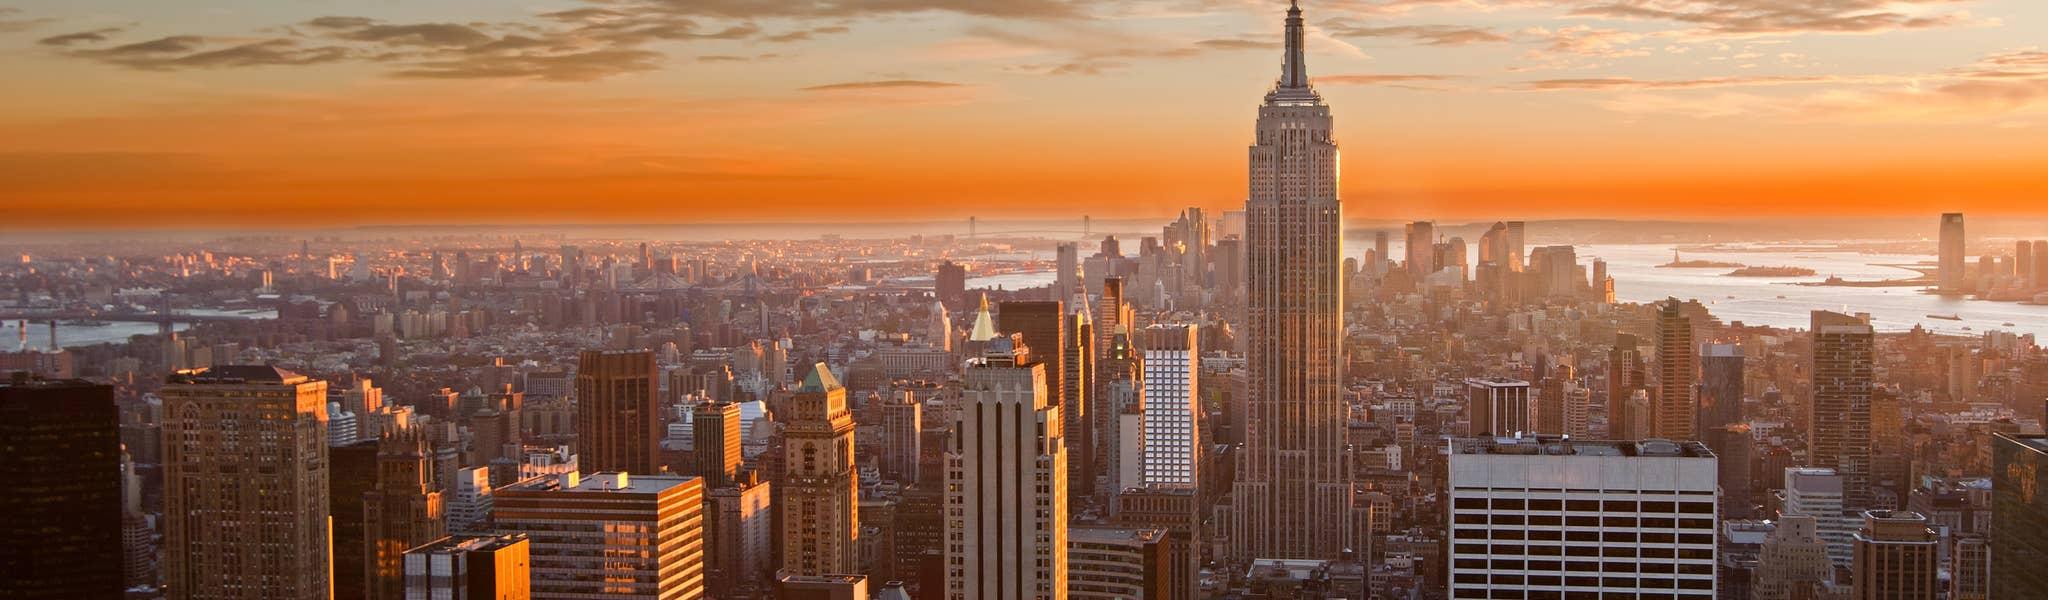 Cheap flights from Edinburgh to New York - Aer Lingus